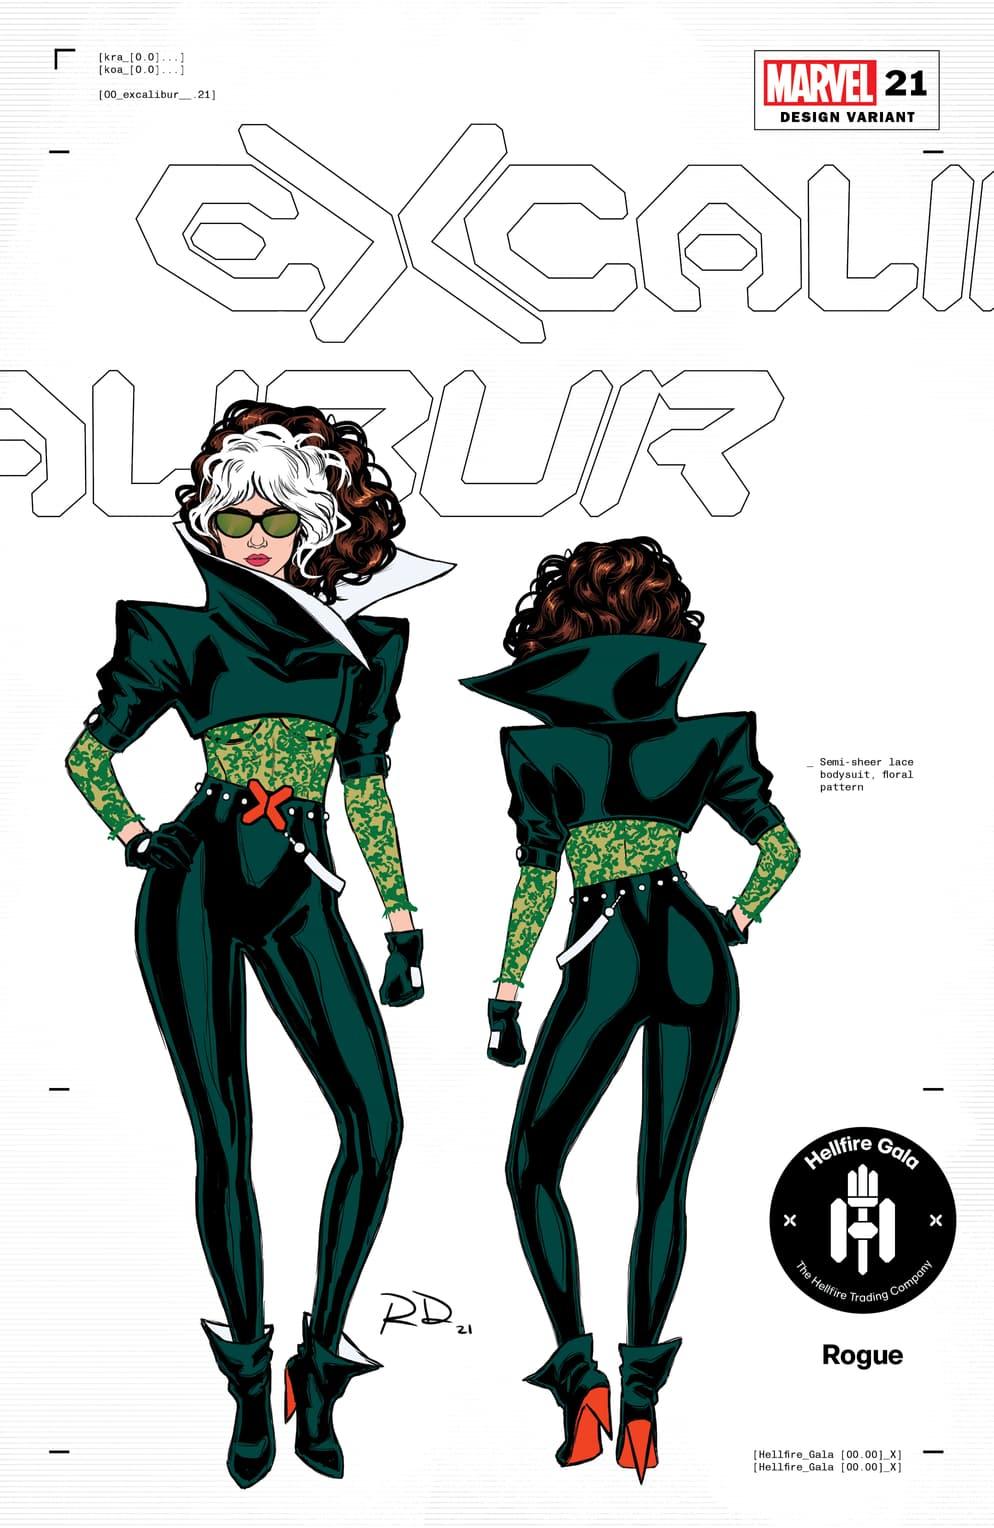 Excalibur 21 variant cover